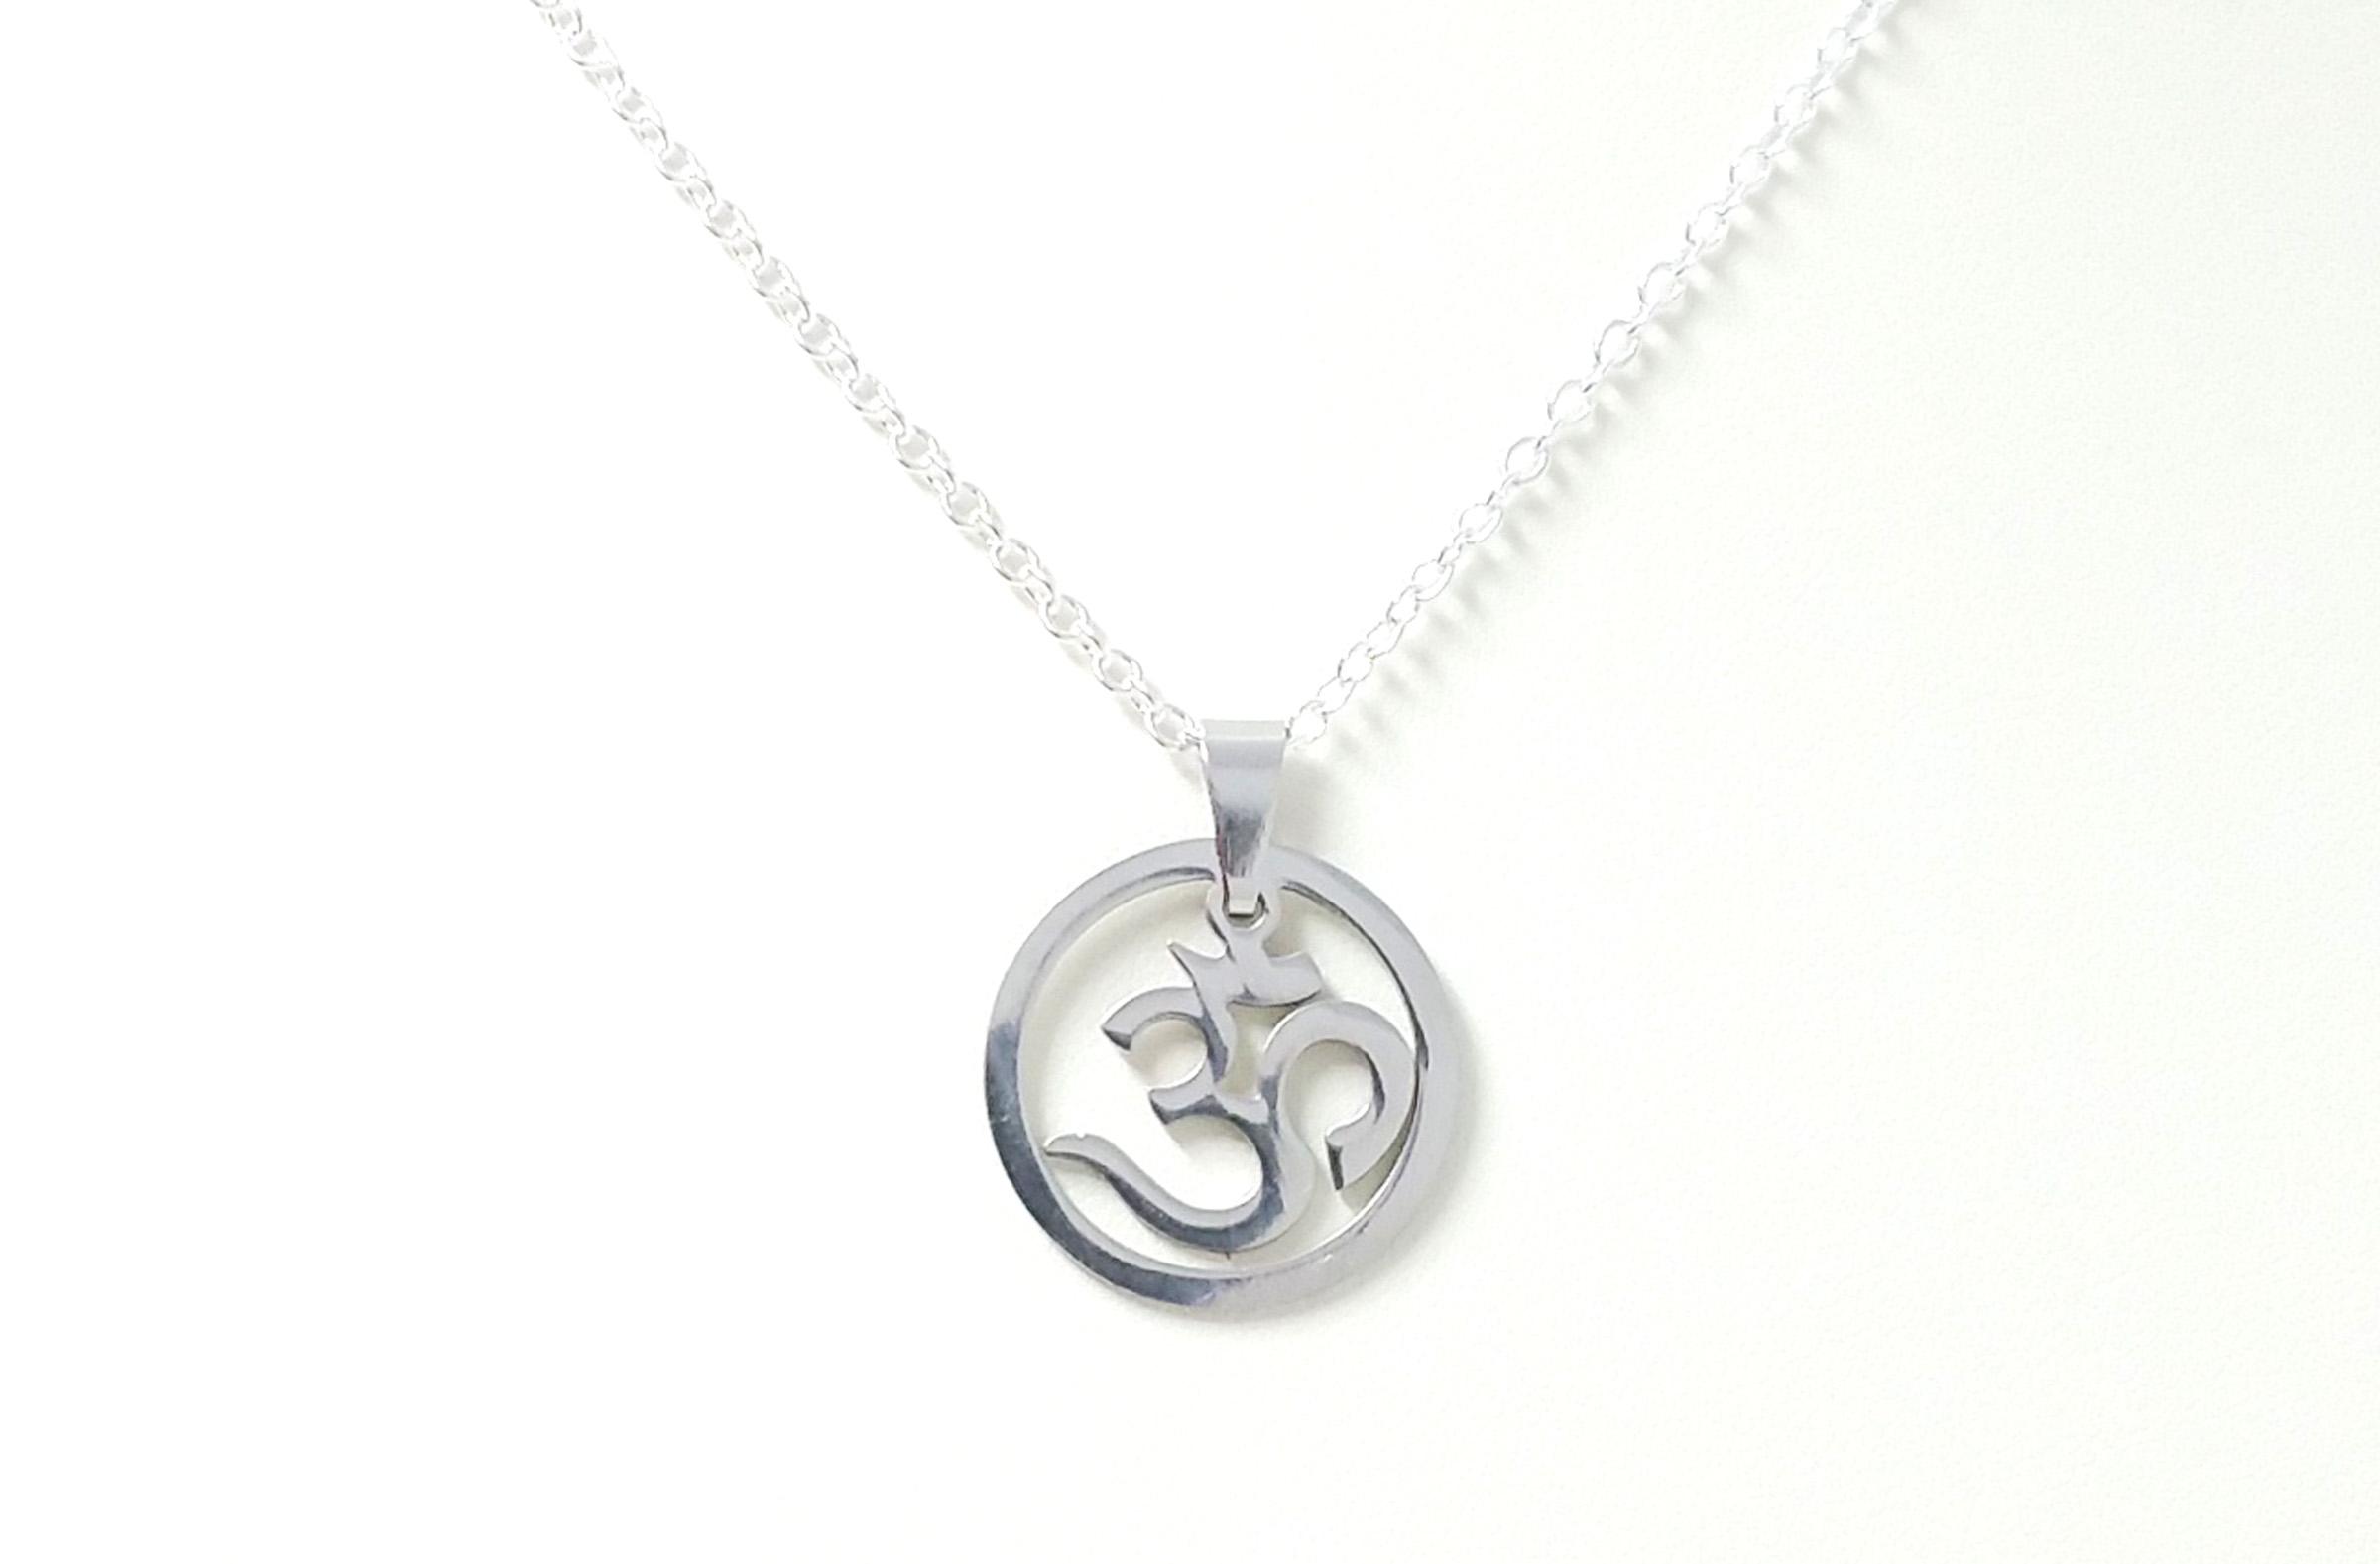 Om Symbol Pendant Necklace Whimsy Gift Shop